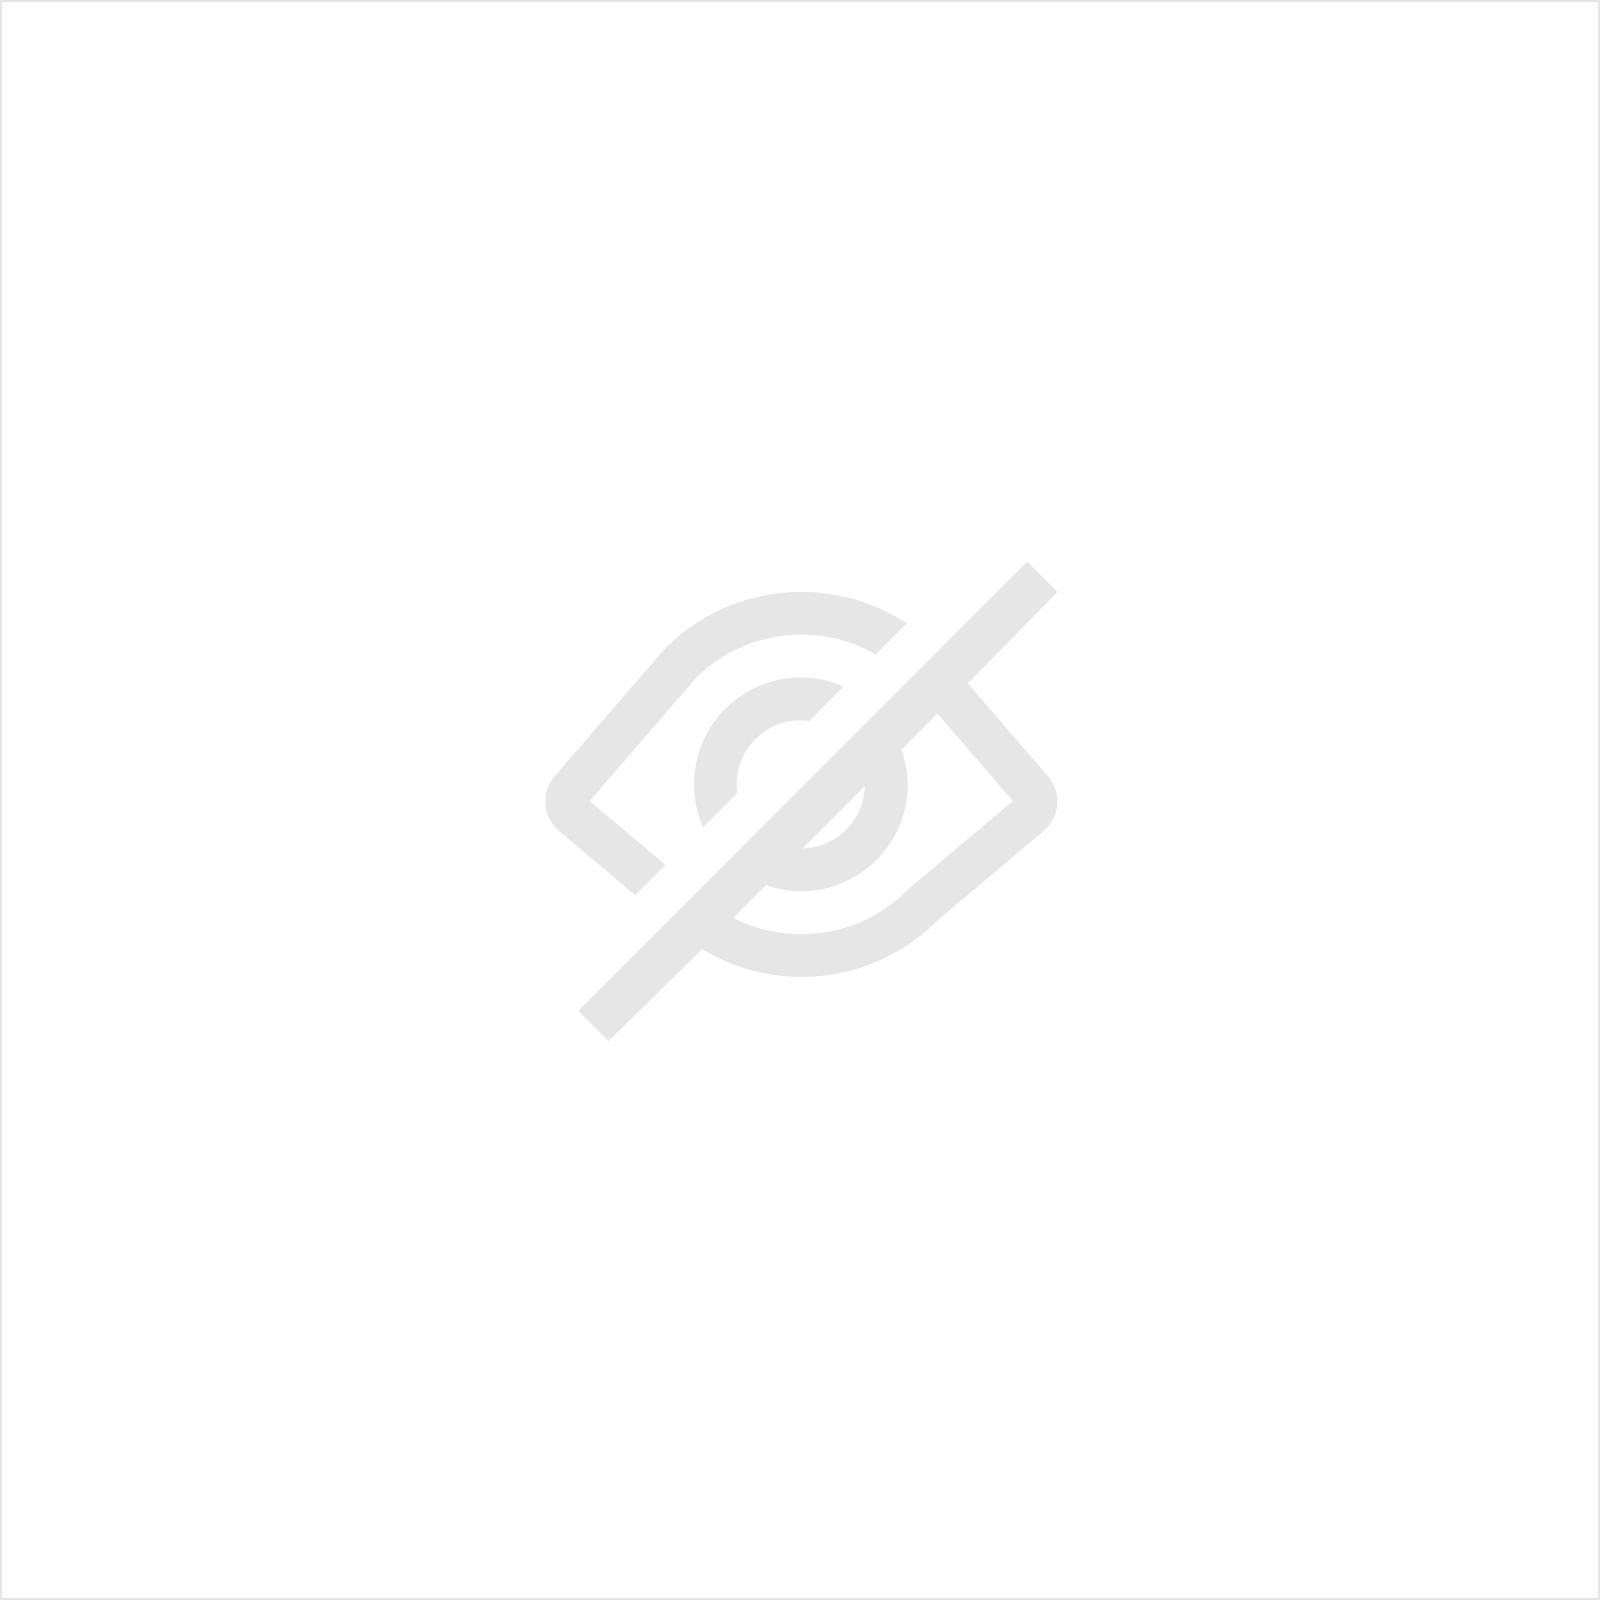 OUATOR AUTO MOTO BOOT/ GLANS KATOEN 75gr